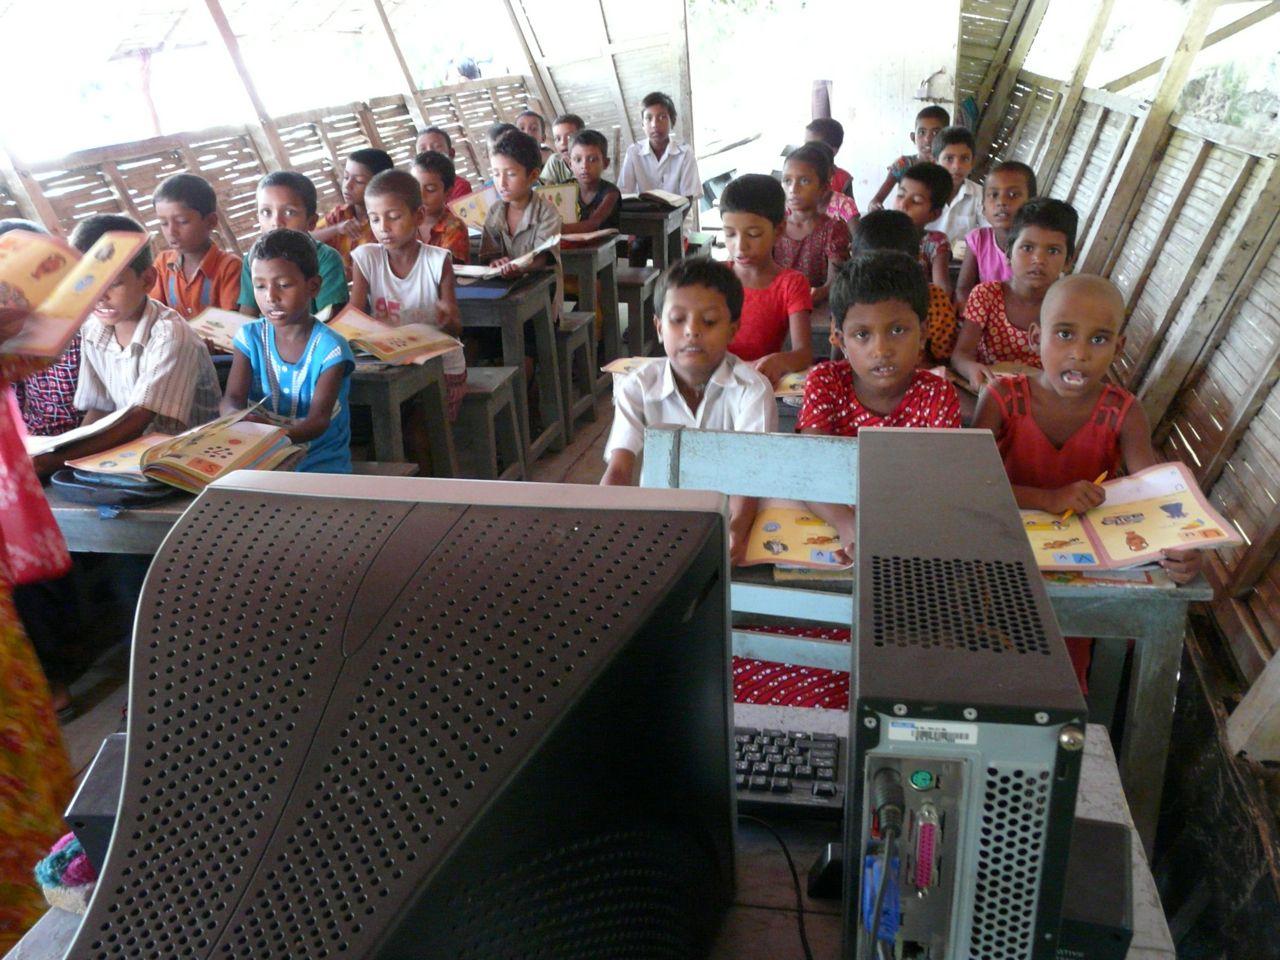 Solar Panels For Boats >> Bangladesh: School Boats Foster Hope | Pulitzer Center